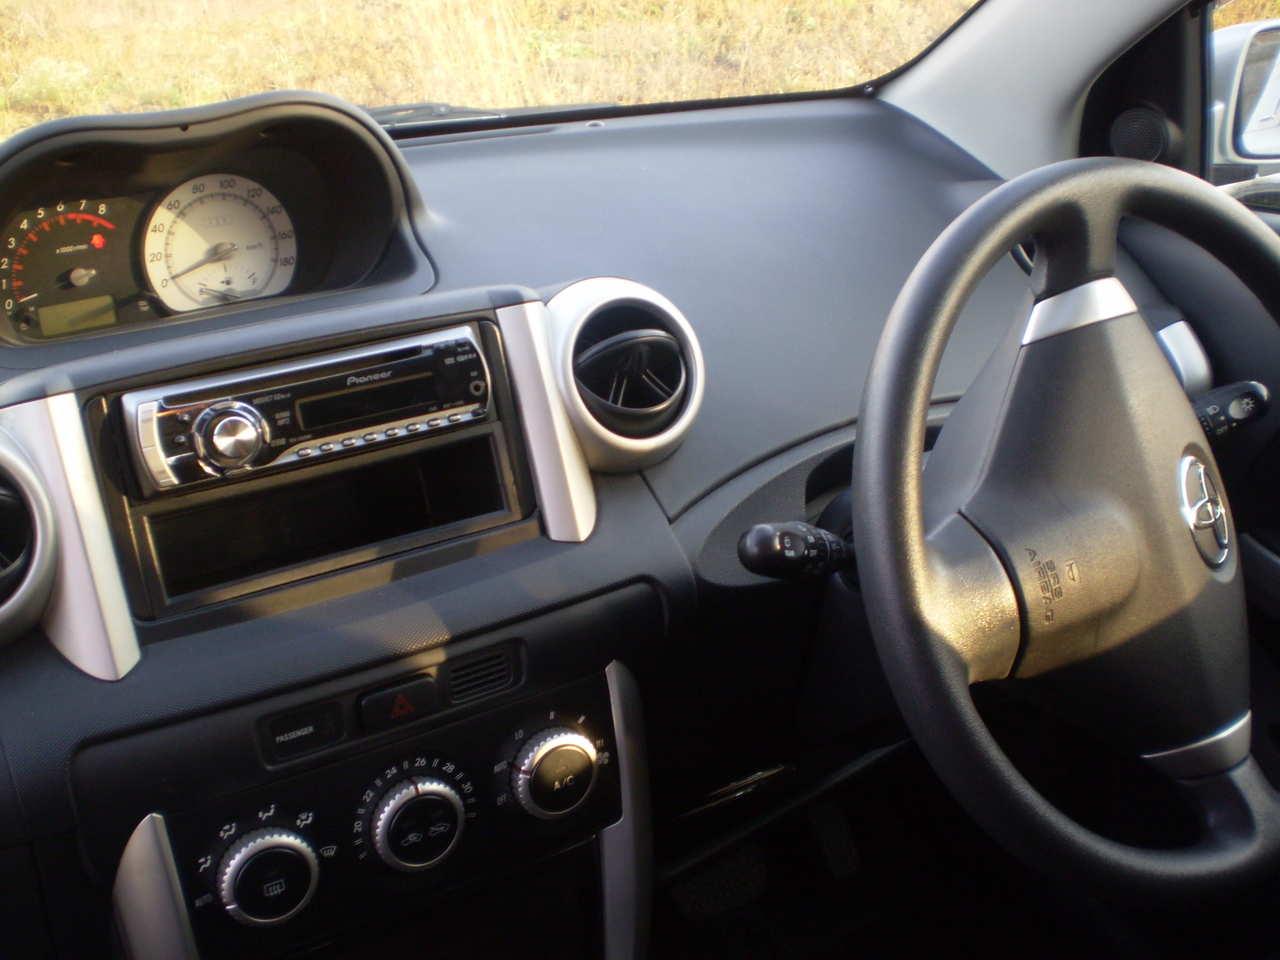 Kelebihan Kekurangan Toyota Ist 2004 Tangguh